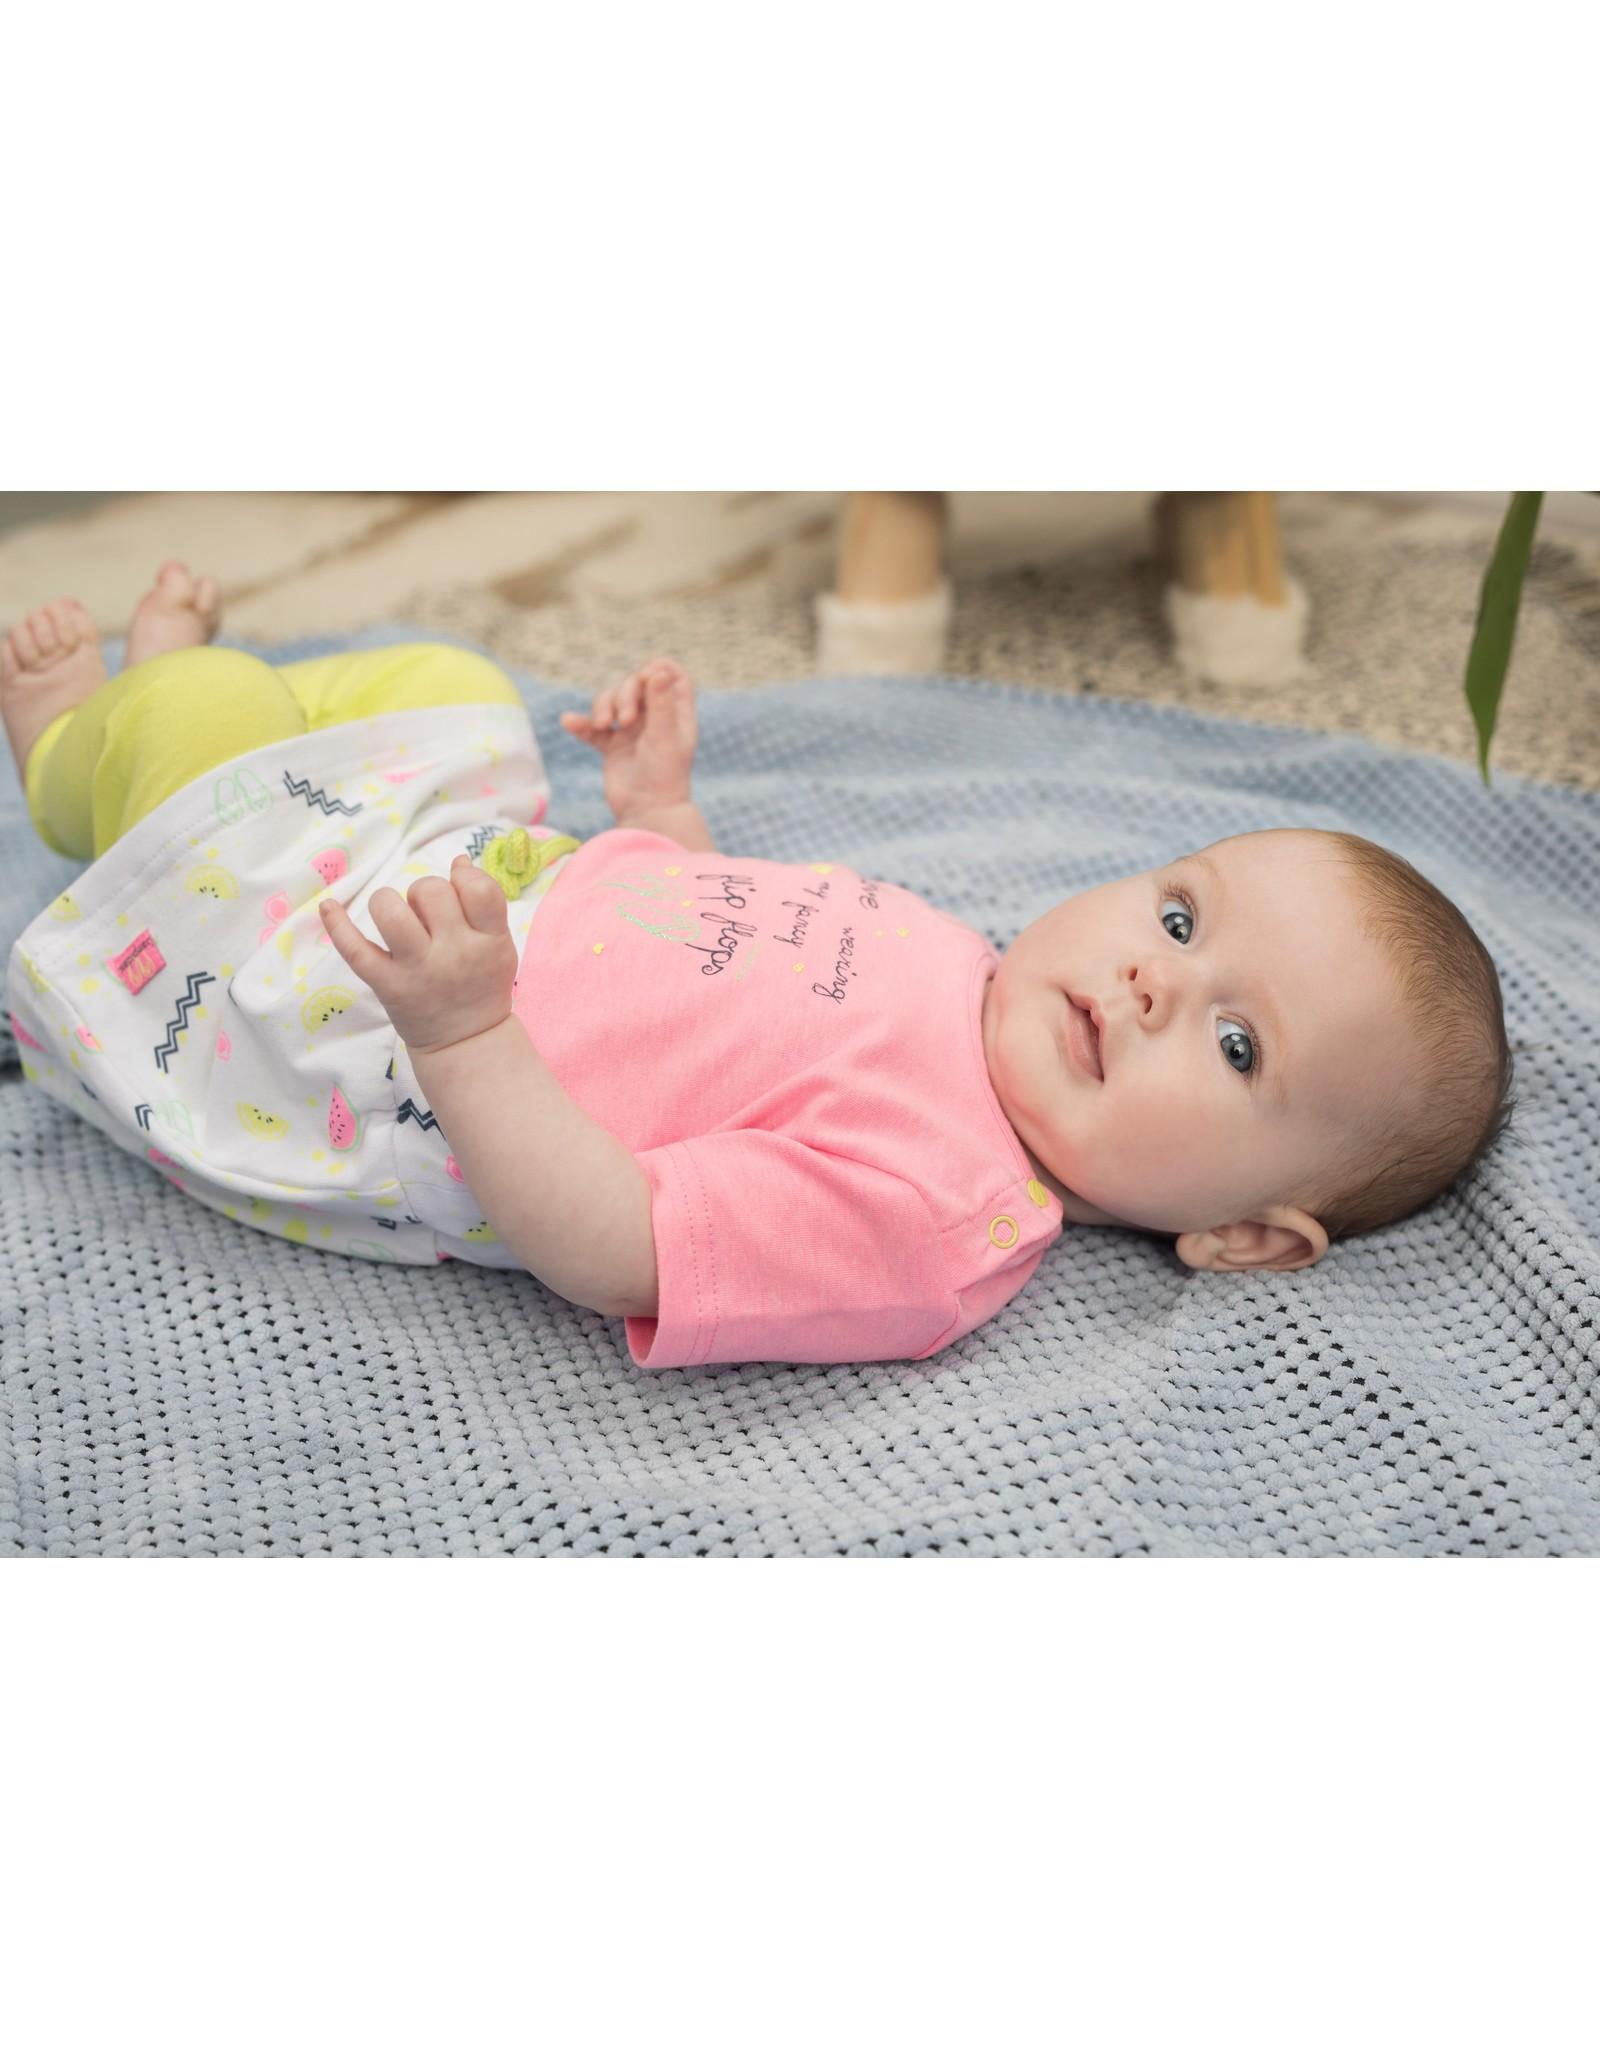 Bampidano Baby Girls multi dress s/s plain top + allover print skirt with waist string, pink